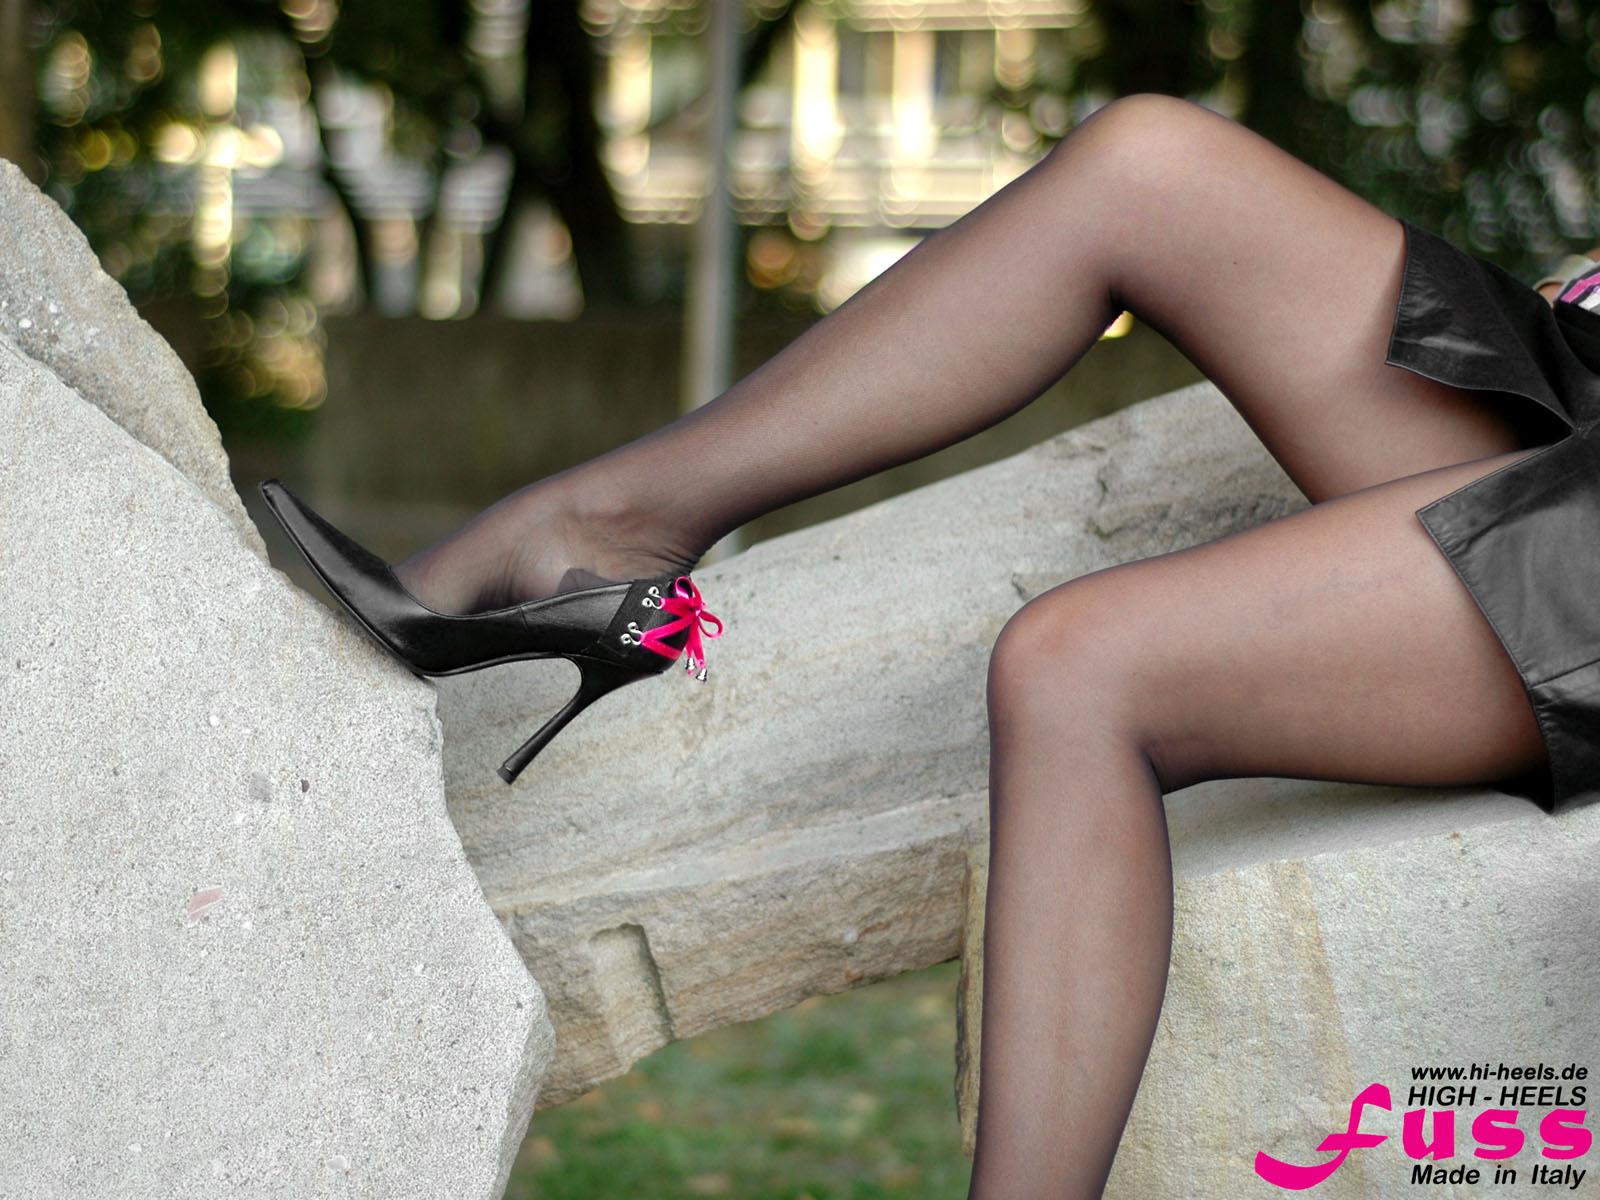 Wallpaper : ladies, stockings, girl, panties, female, foot